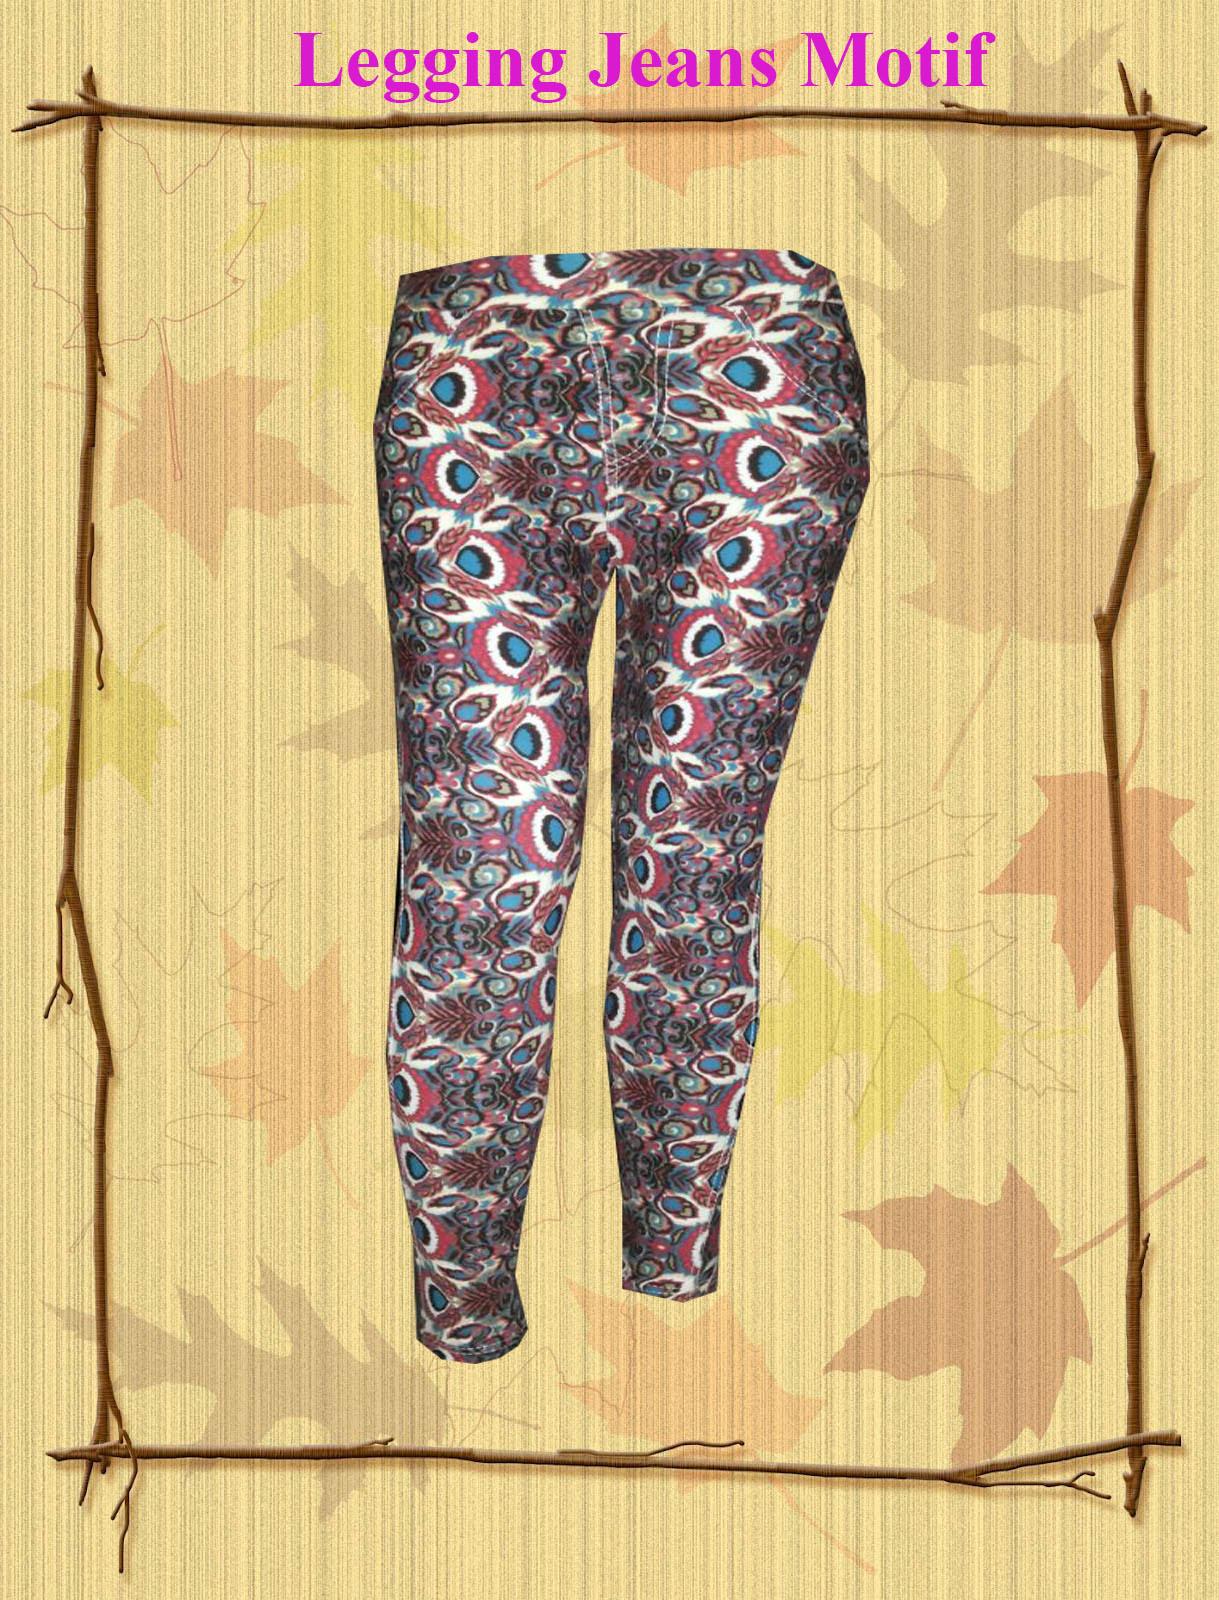 Legging Jeans motif1